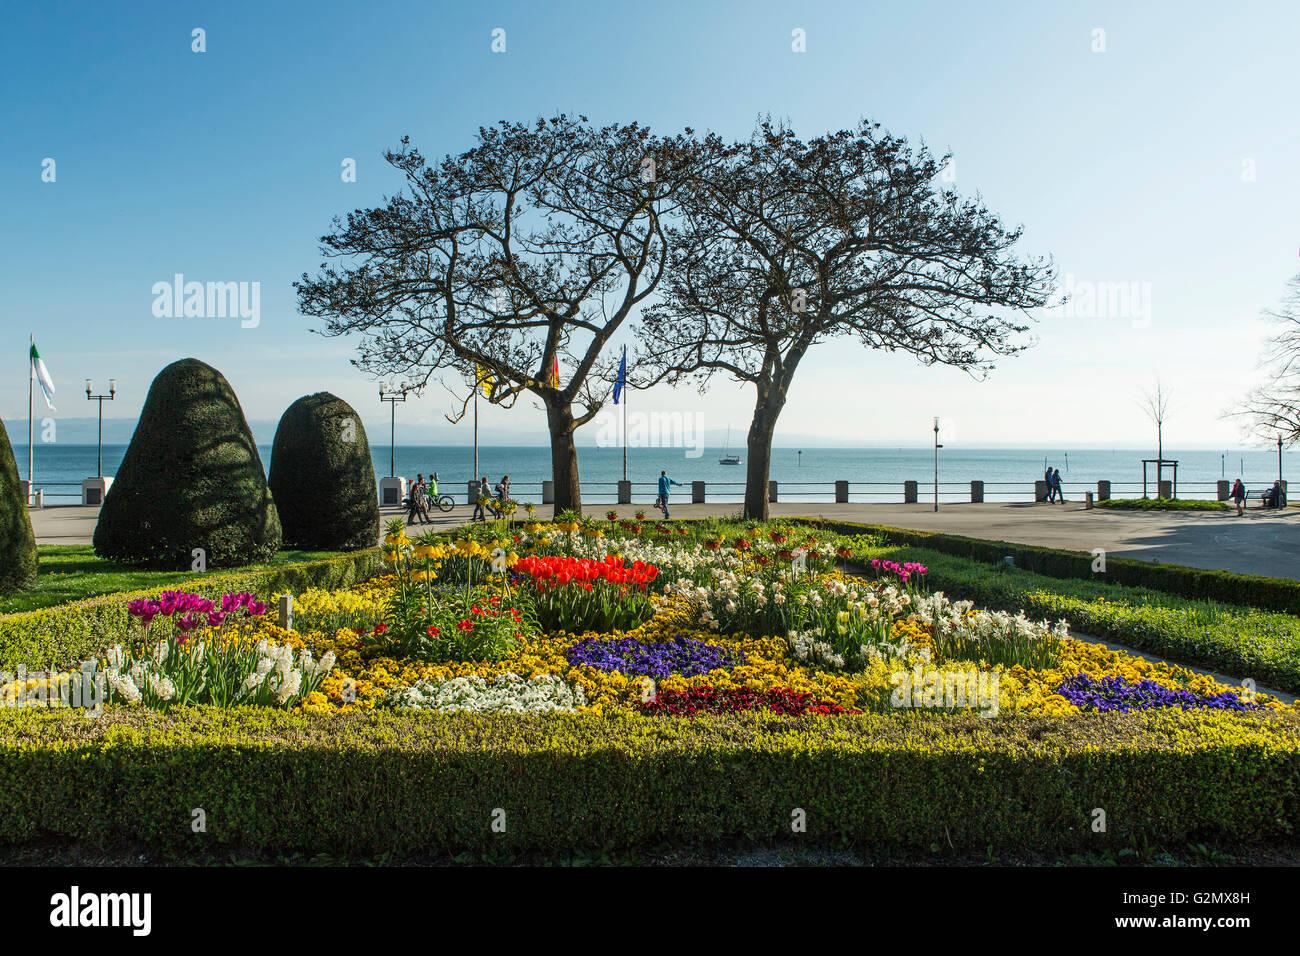 Flowering park at Lake Constance in Friedrichshafen harbor. - Stock Image